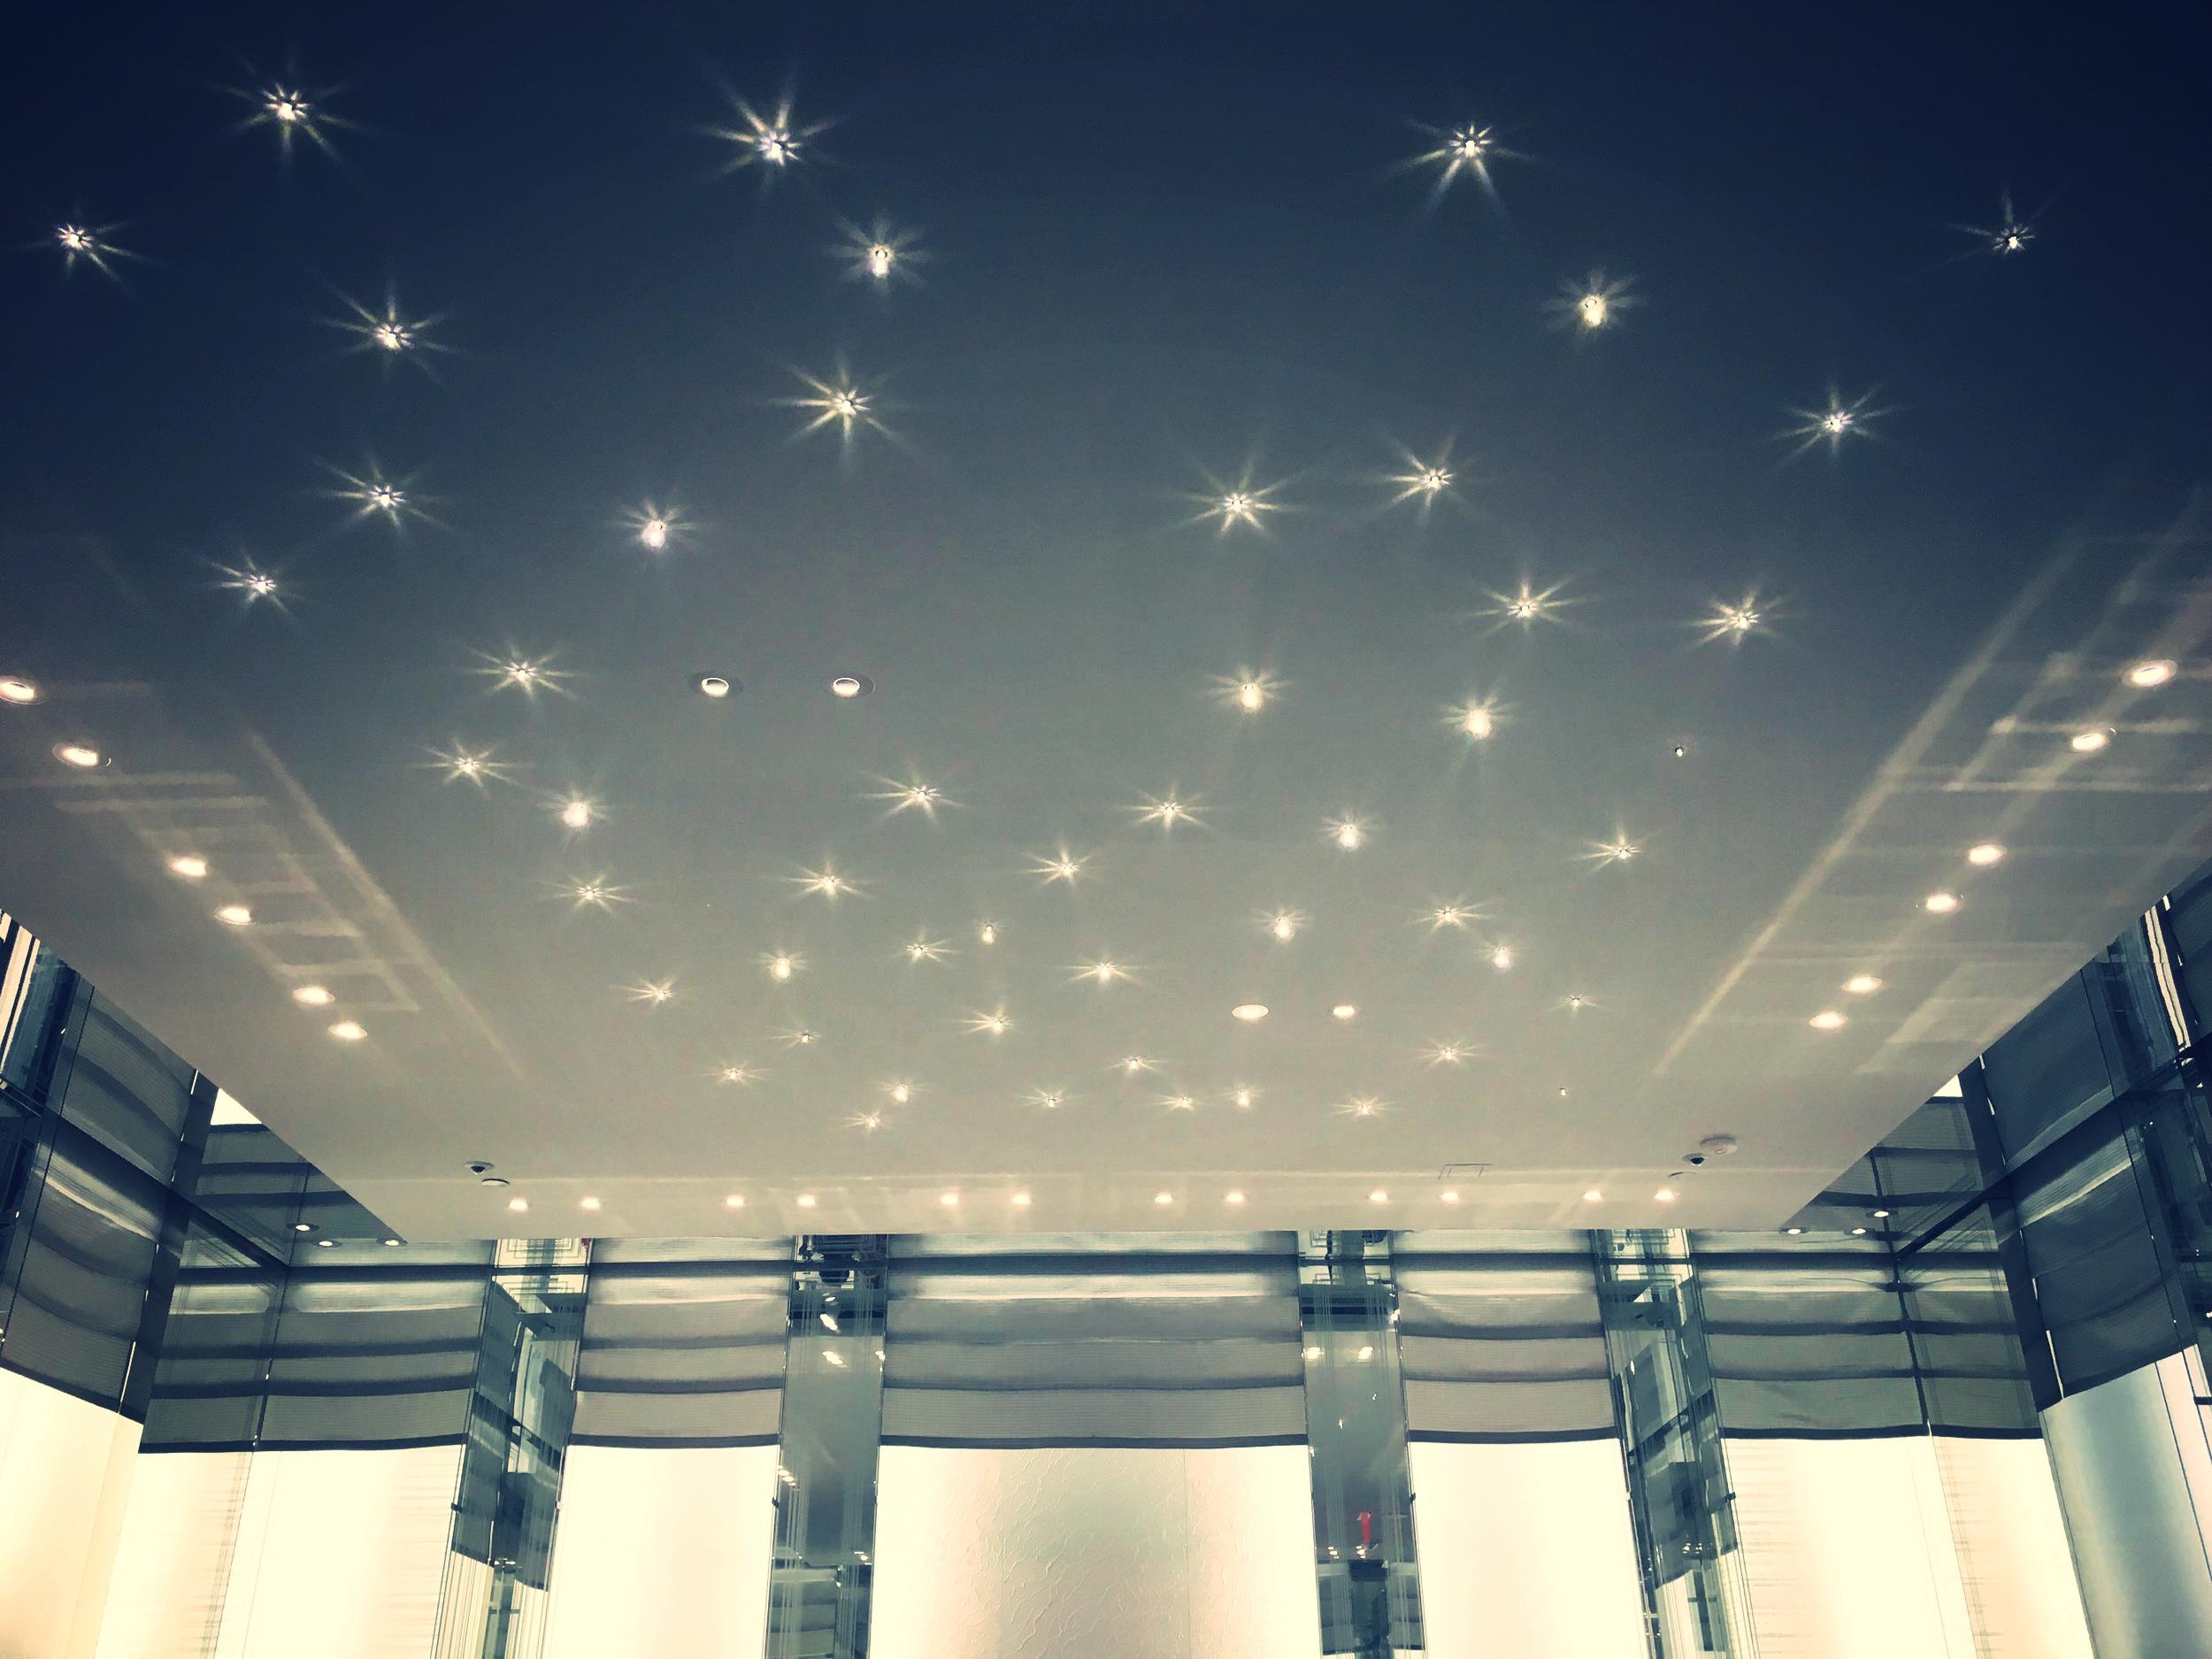 The Dior Atlanta ceiling glistened and sparkled.